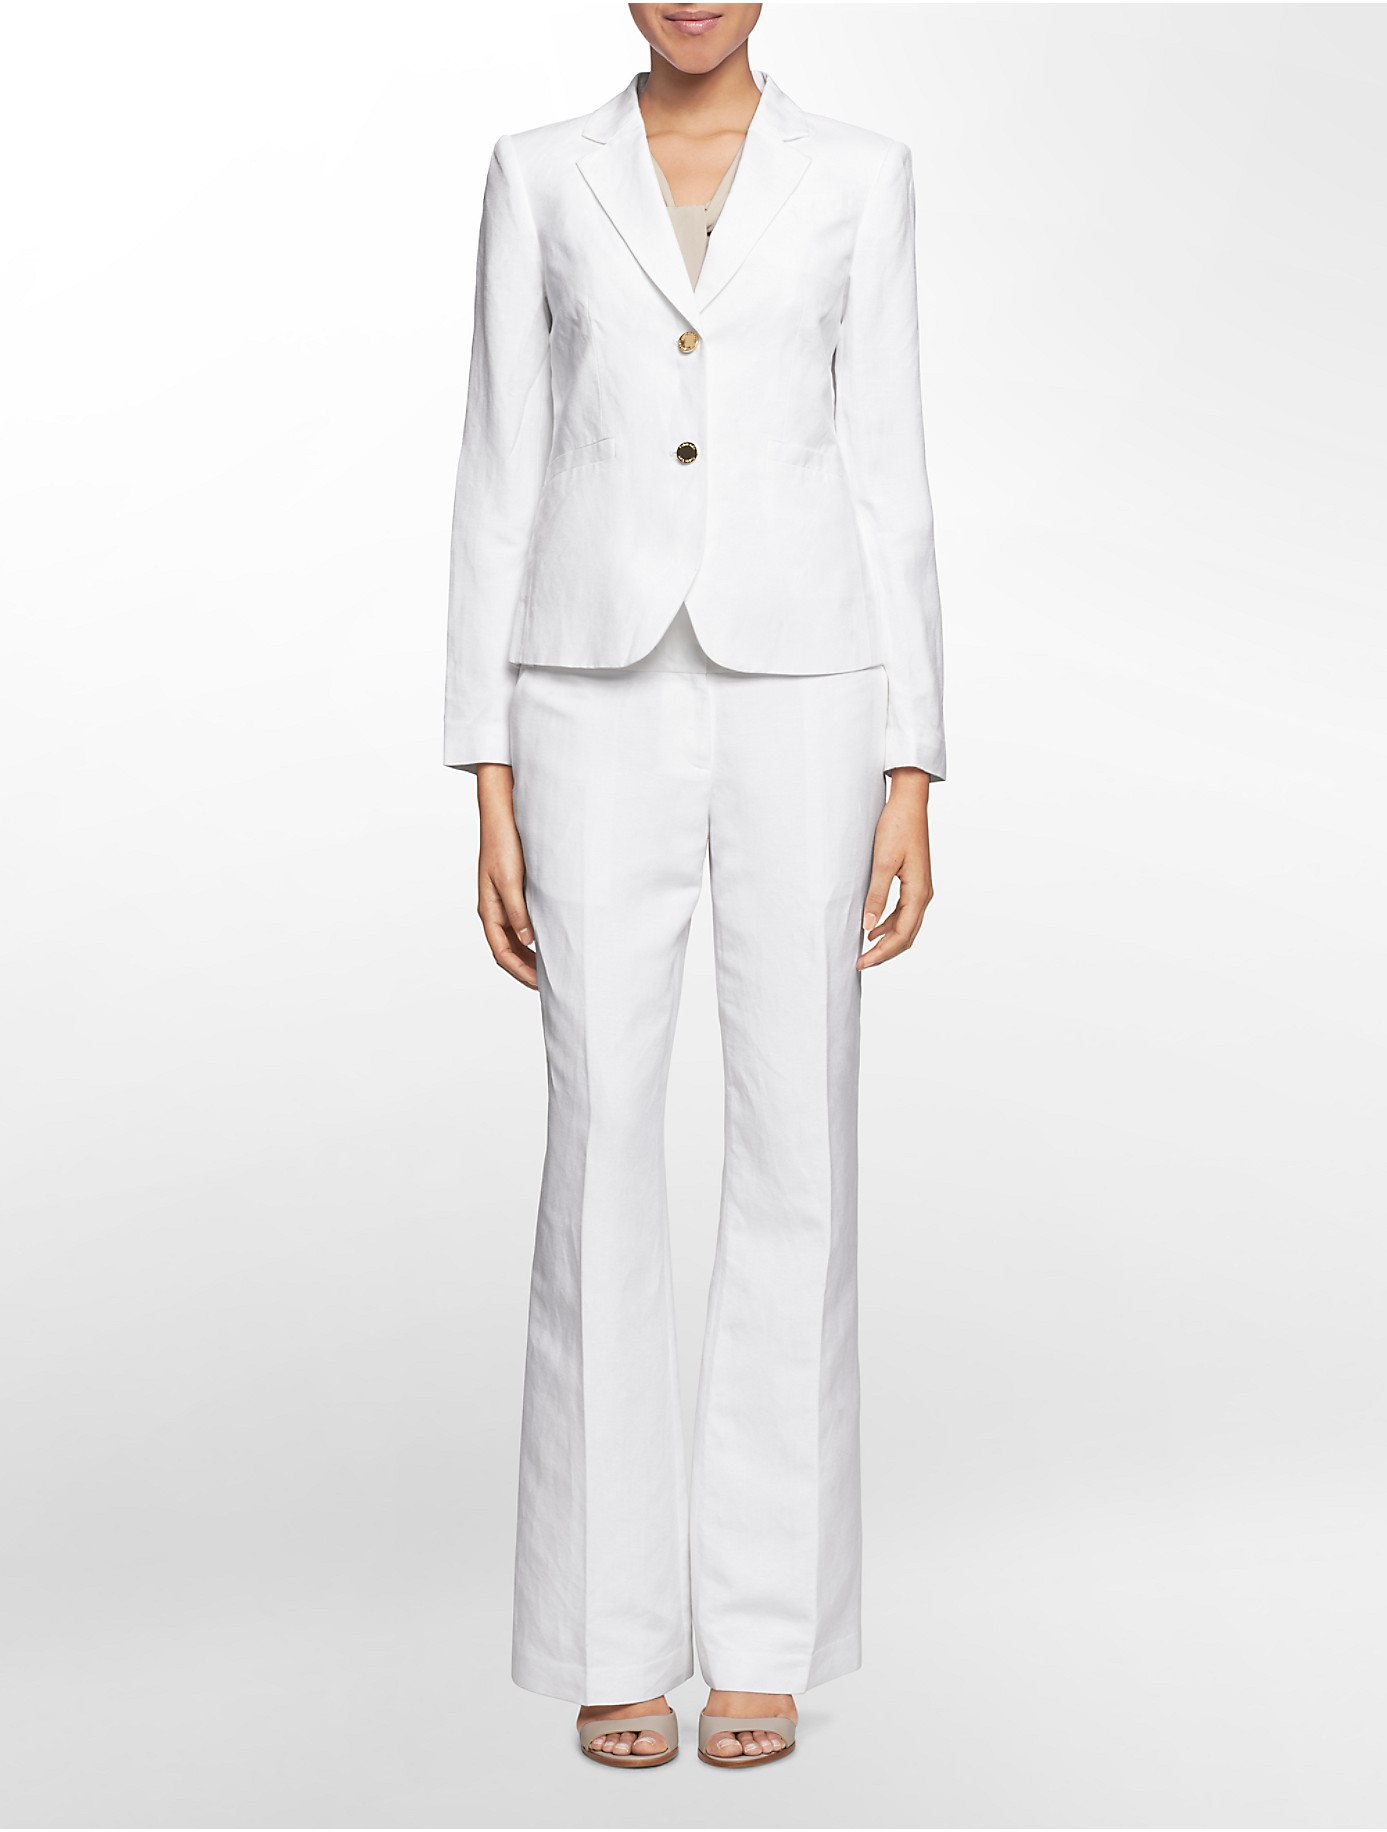 Lyst Calvin Klein White Label Two Button Linen Suit Jacket In White